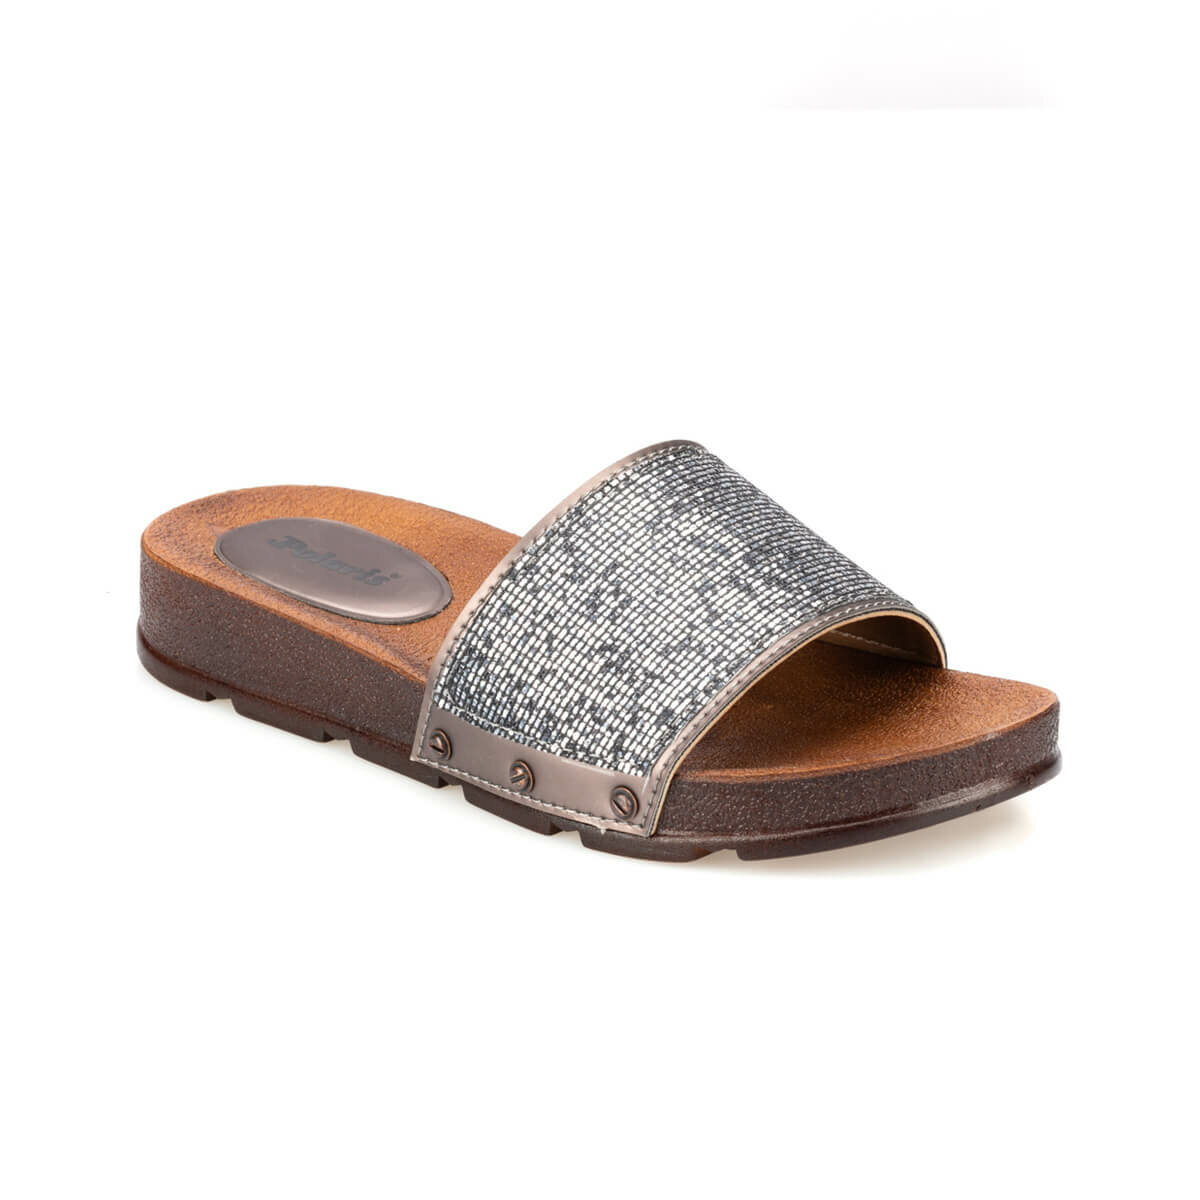 FLO 91.313583.Z Bronze Women 'S Slippers Polaris